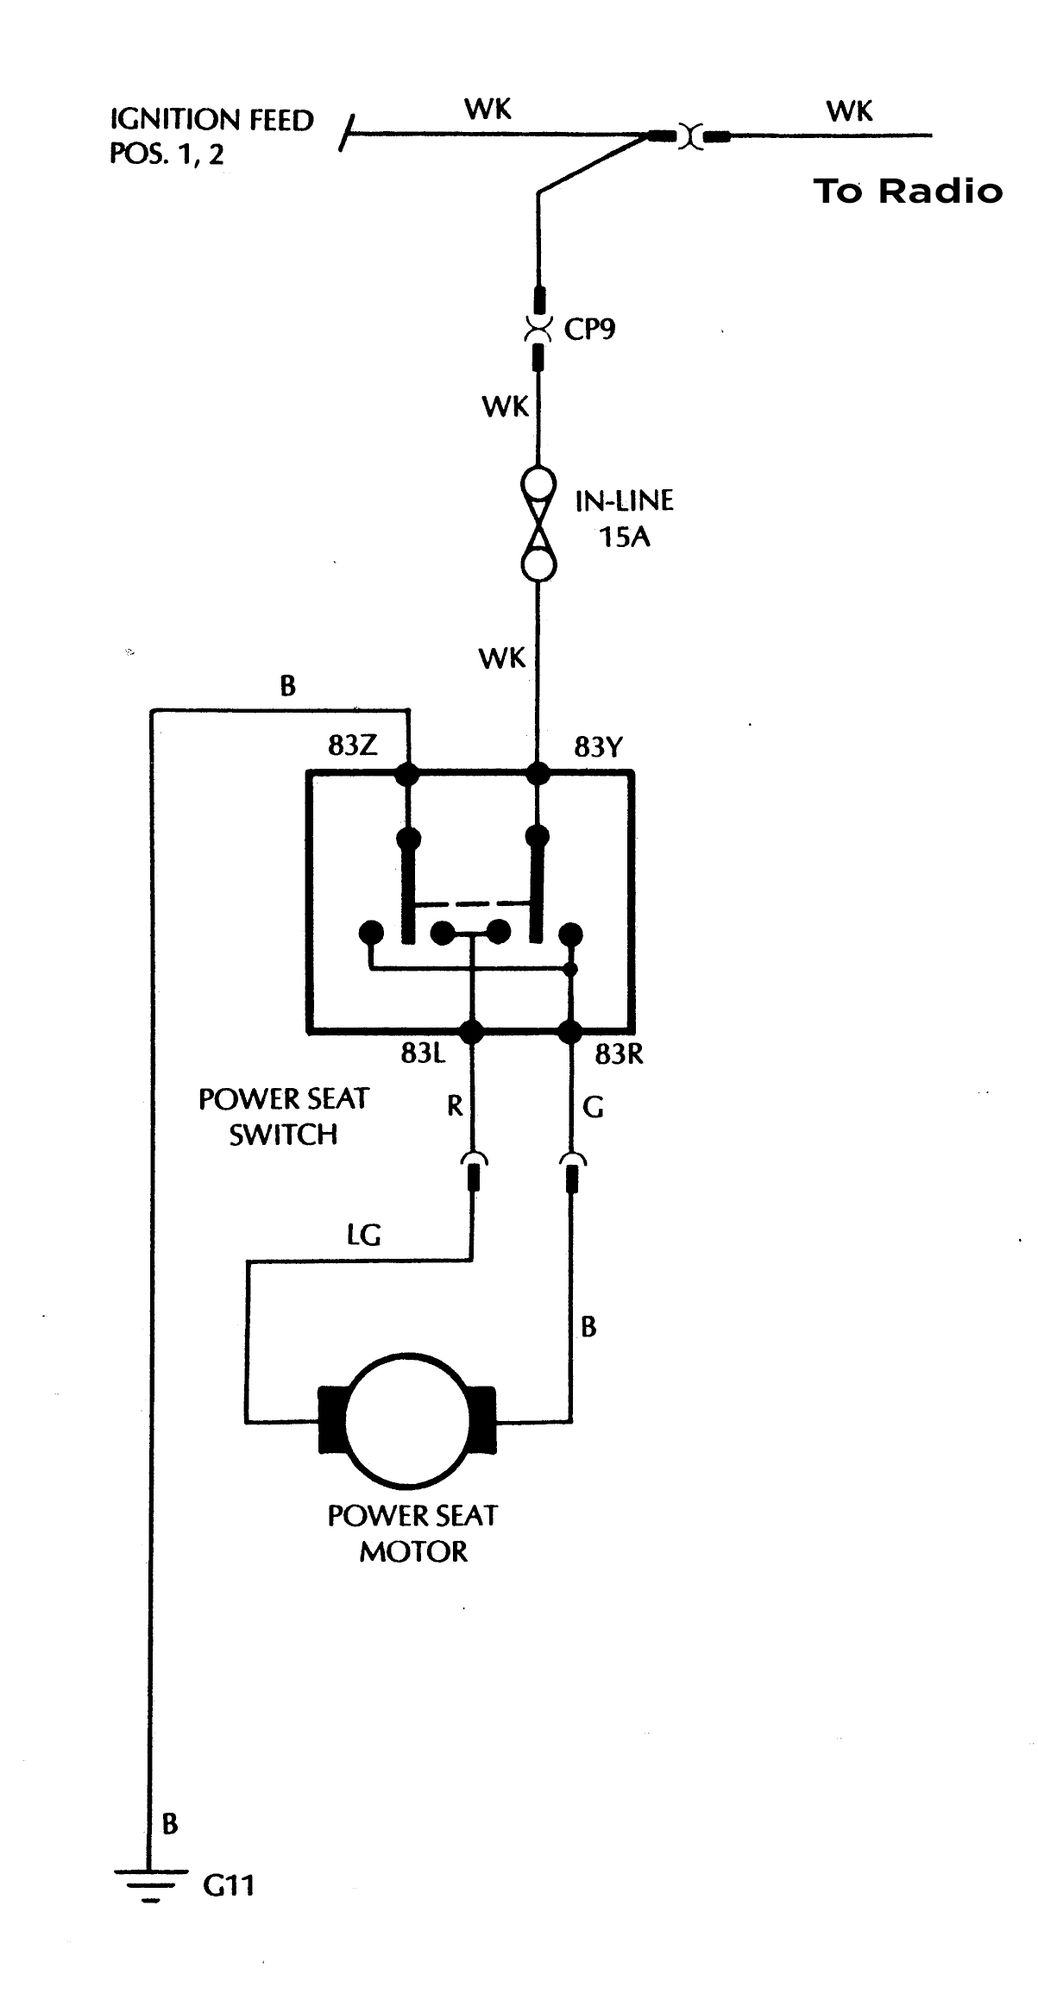 Power Seat Diagram